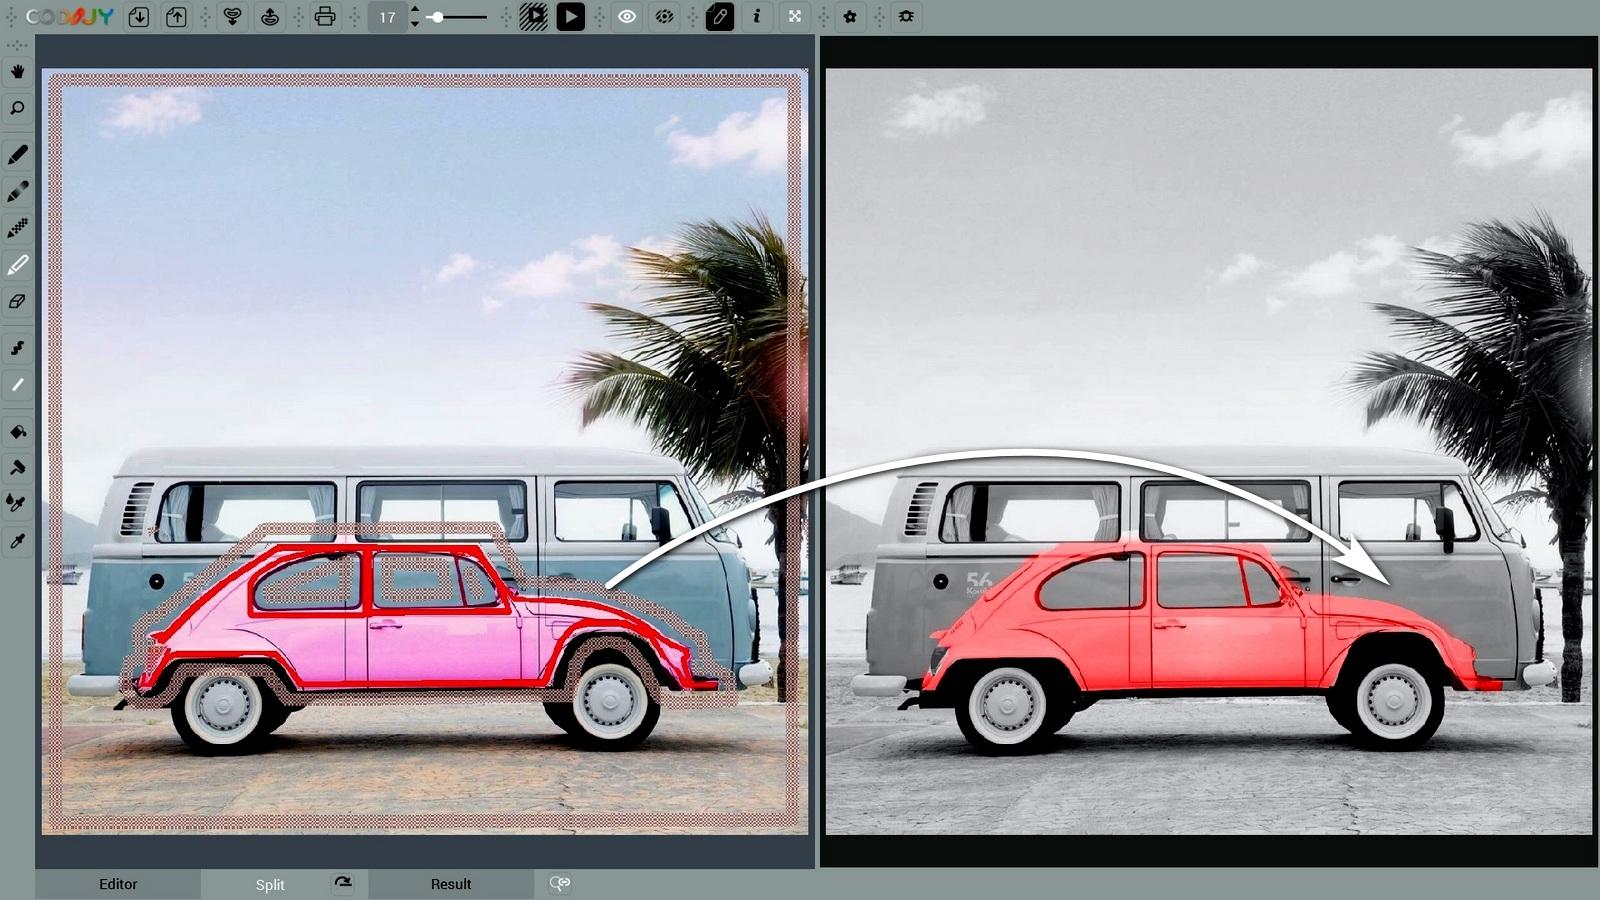 decoloring-recoloring07-1